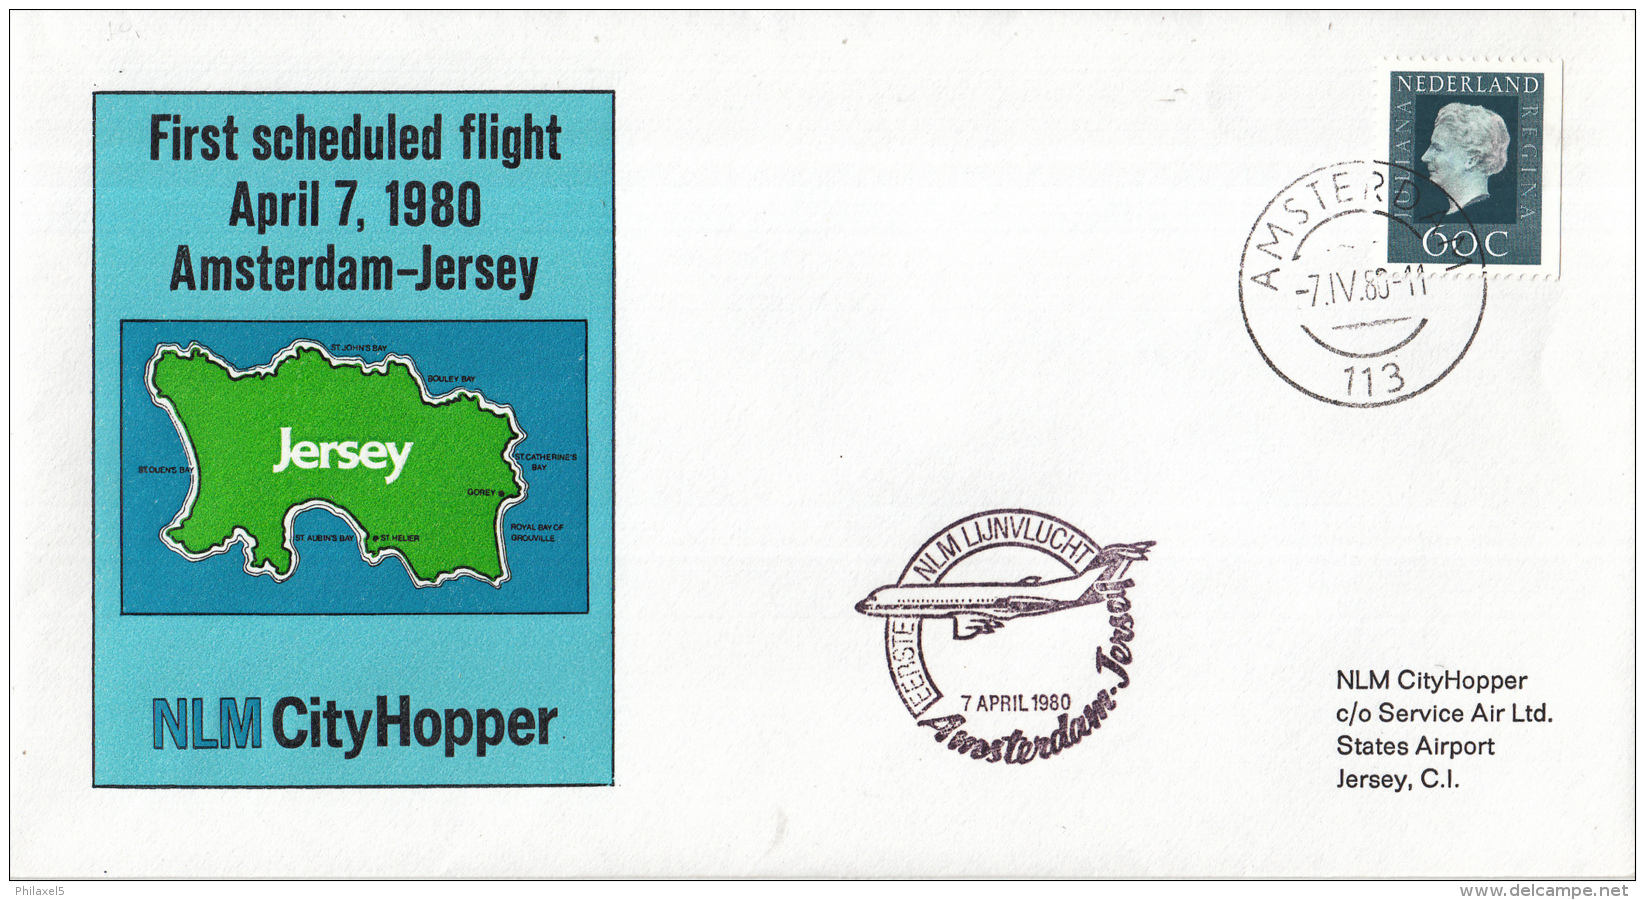 Nederland - 1ste Vlucht - 7 April 1980 - Amsterdam-Jersey - Vl. Hol. 1002a - Marcofilie - EMA (Print Machine)